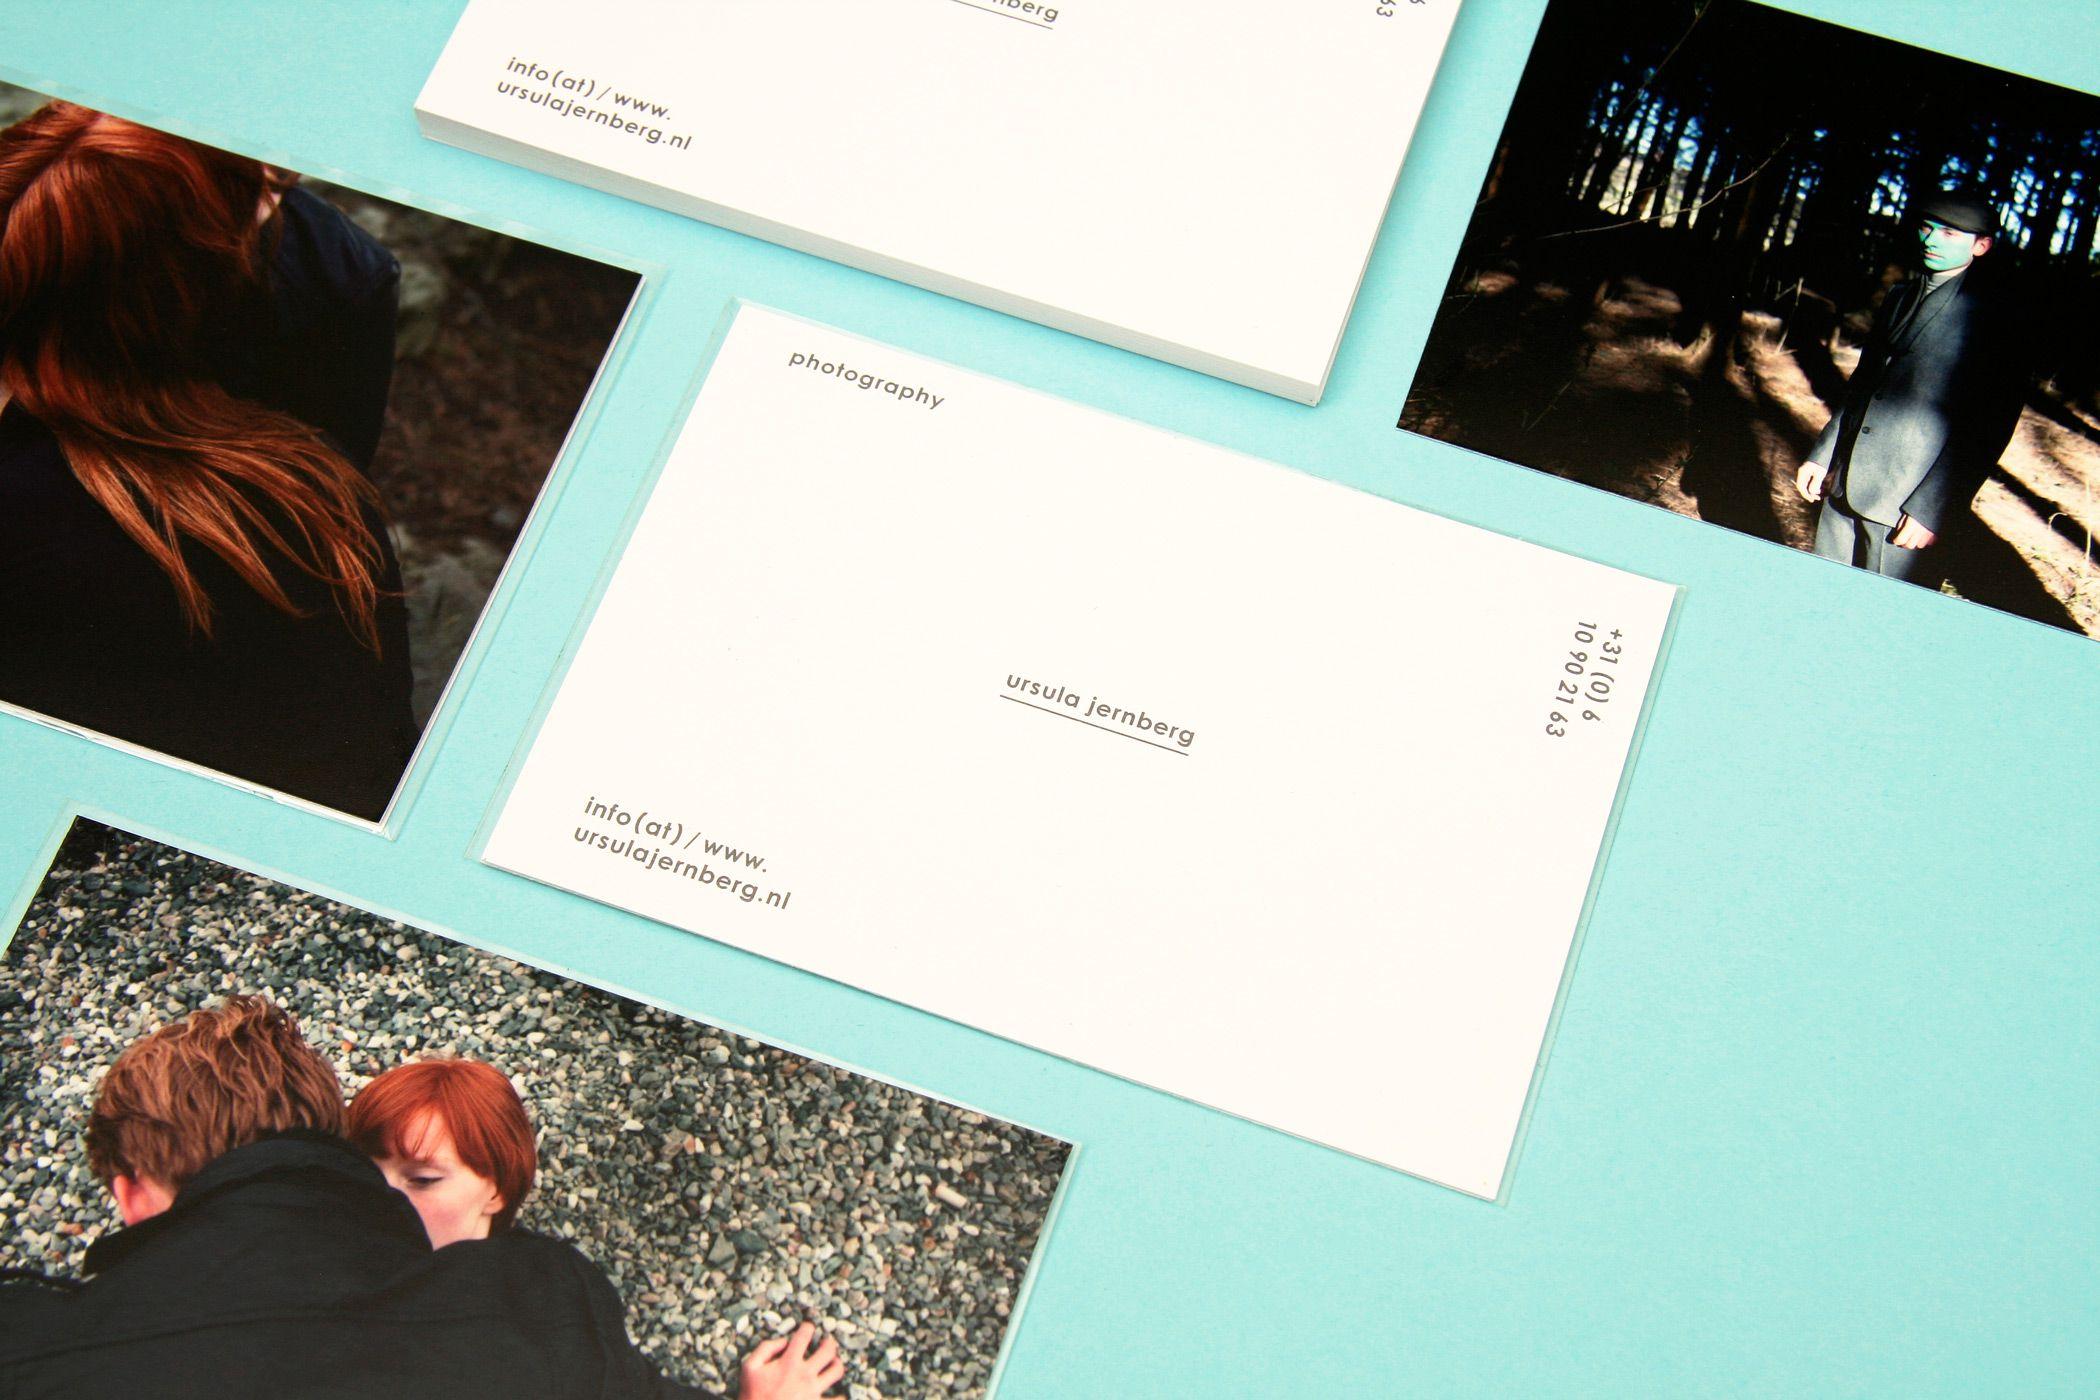 BarbaraHennequin-Identity-UrsulaJernberg-04